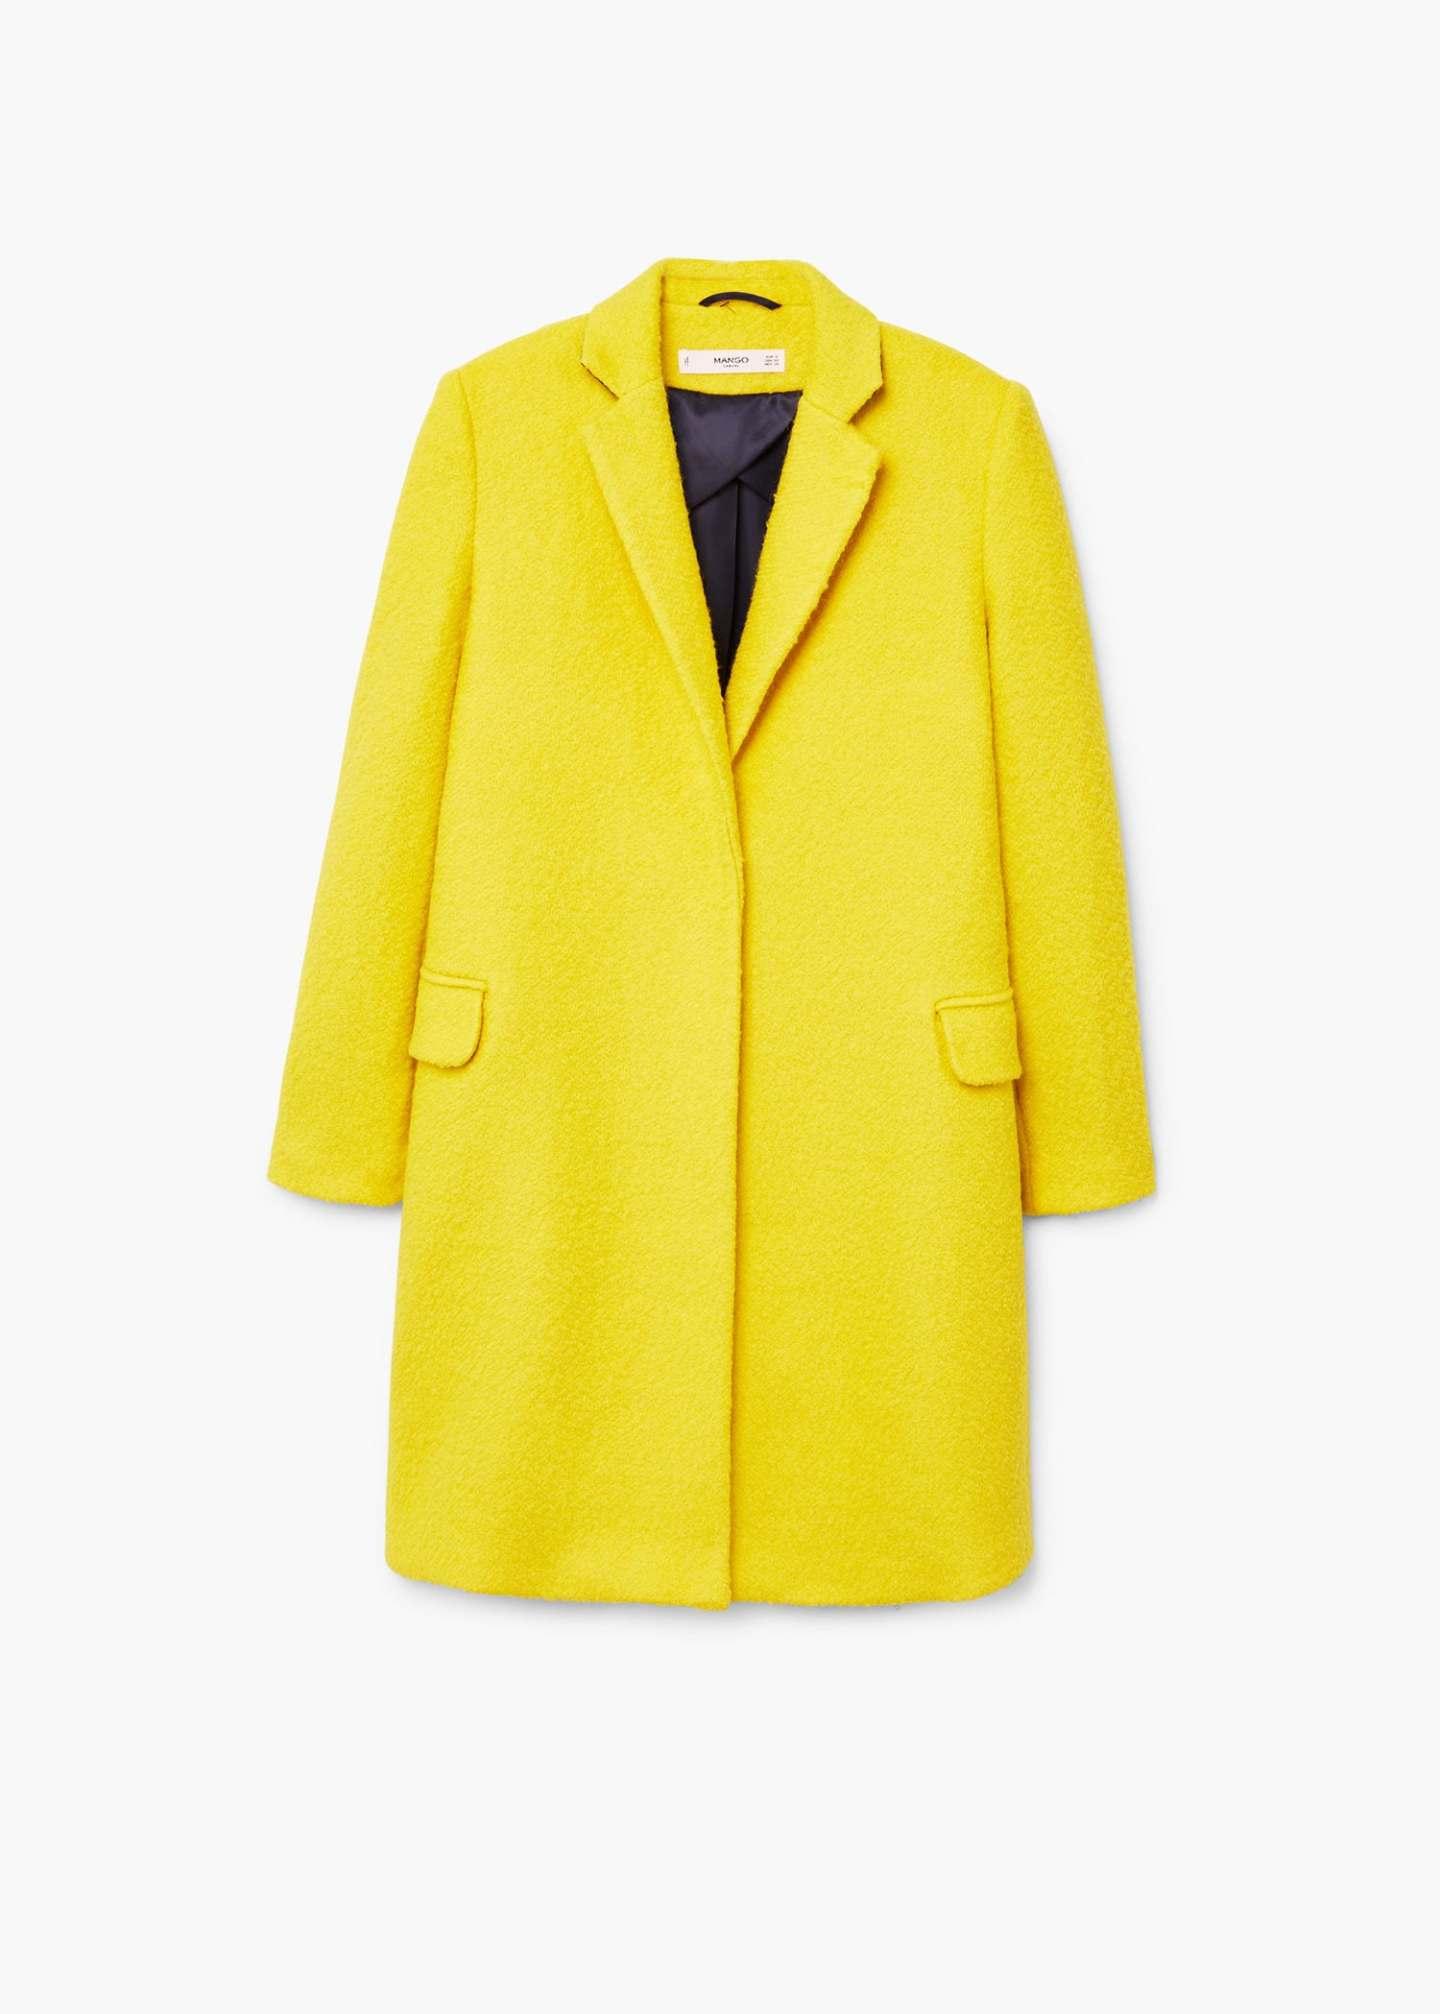 mango yellow coat